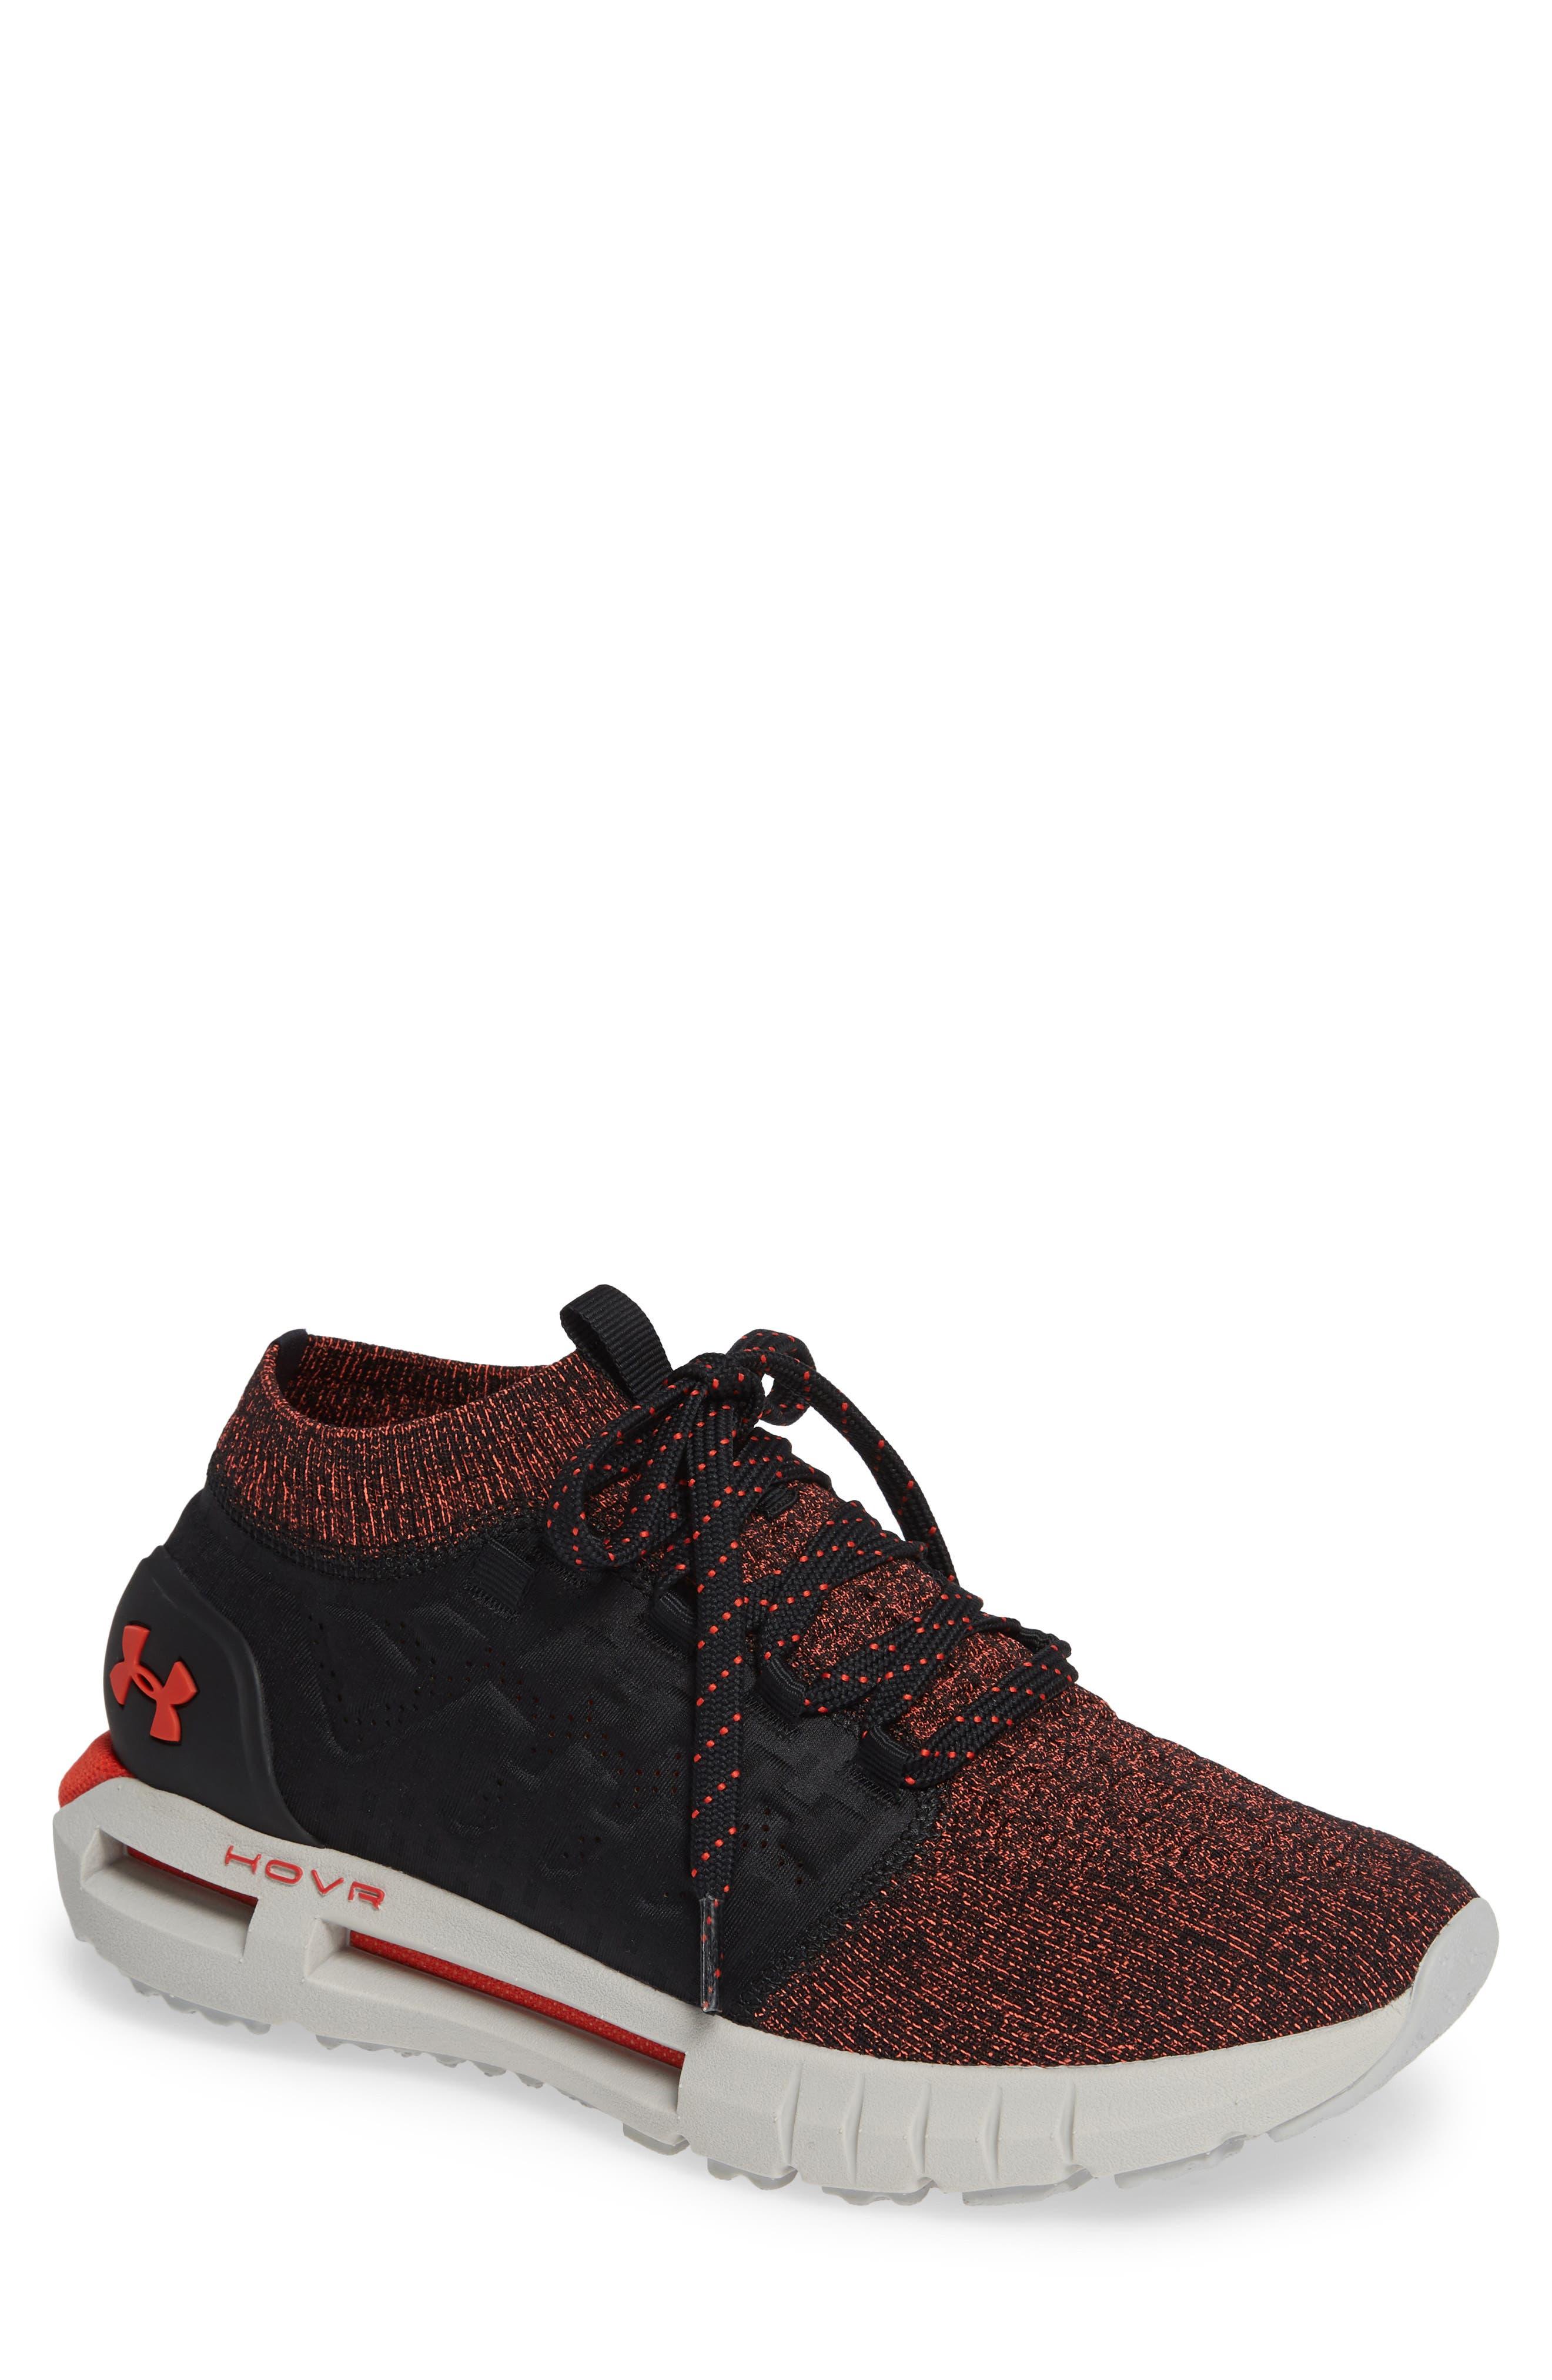 HOVR Phantom NC Sneaker,                             Main thumbnail 1, color,                             Black/ Ghost Grey/ Radio Red